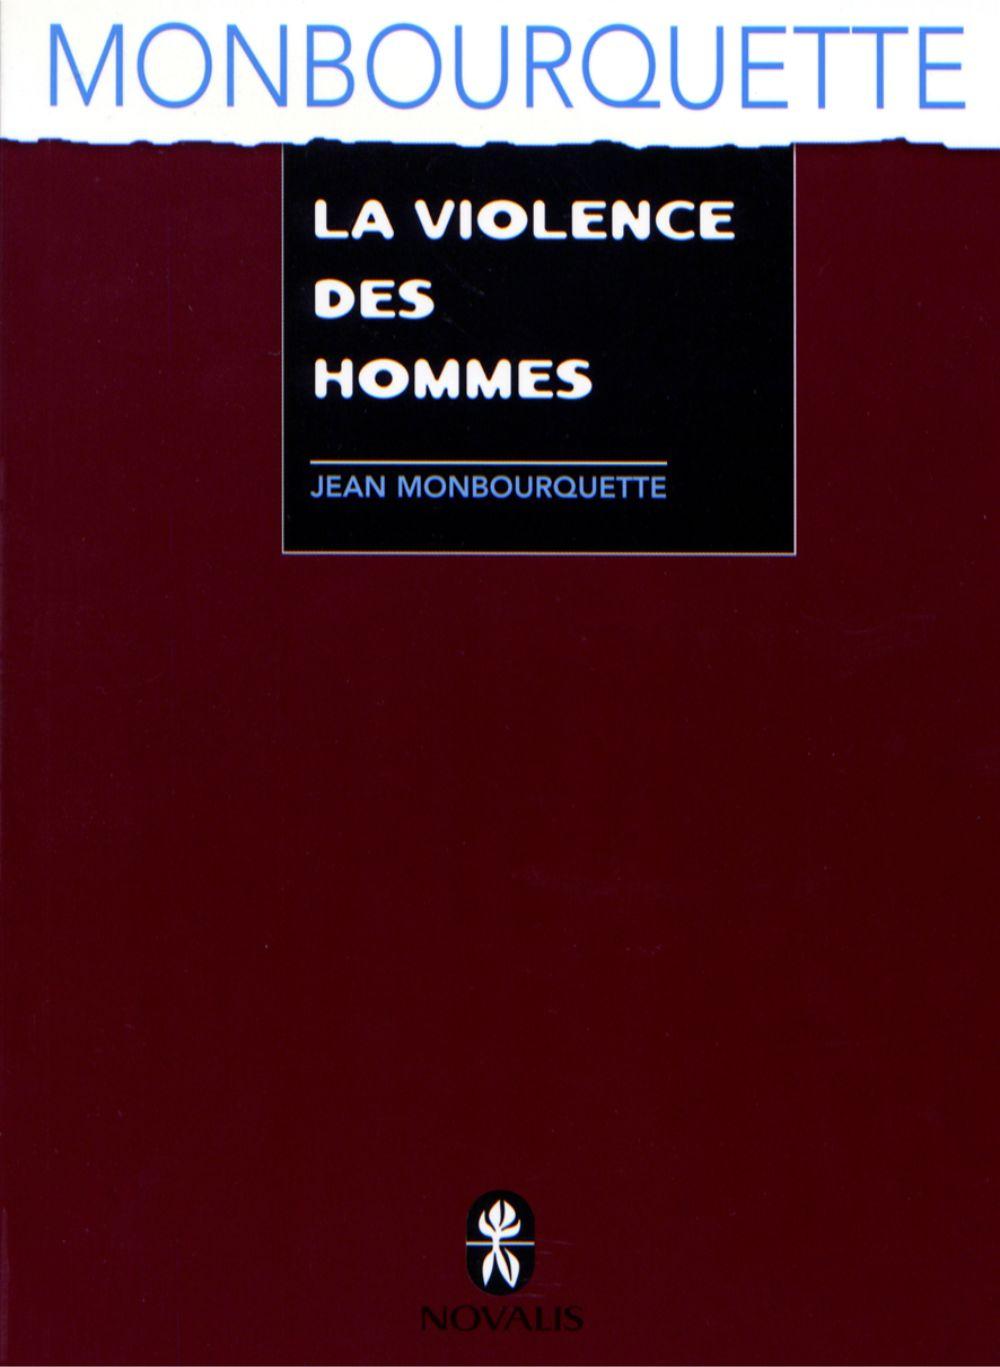 La violence des hommes